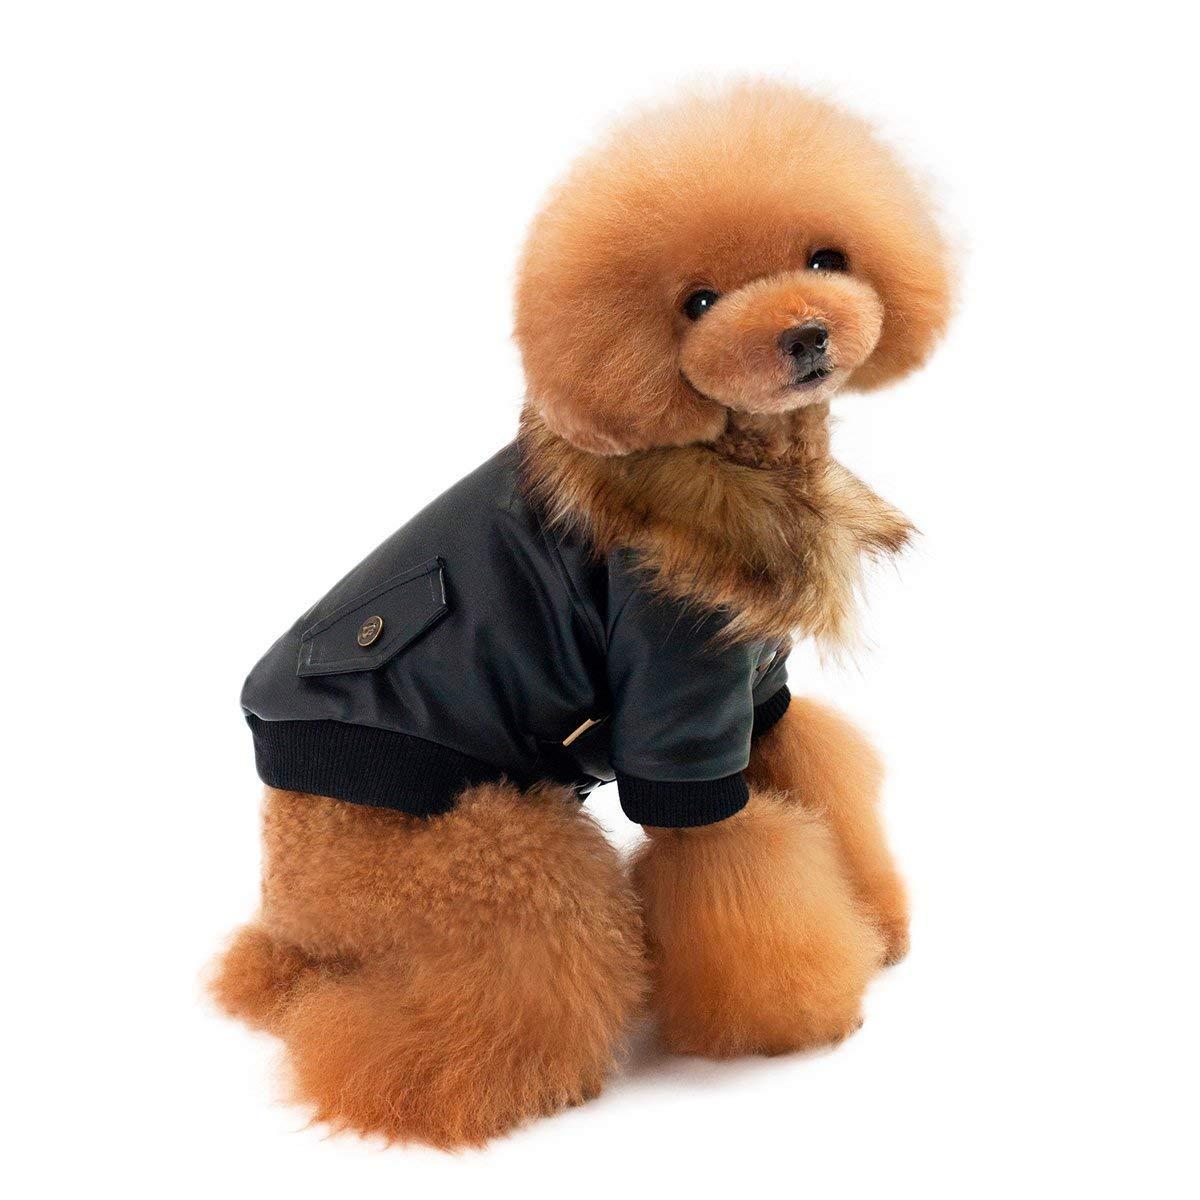 Abzon Dog Leather Jacket Weatherproof Microfiber Leather Dog Winter Coat for Cold Weather Warm Dog Jacket.(M)